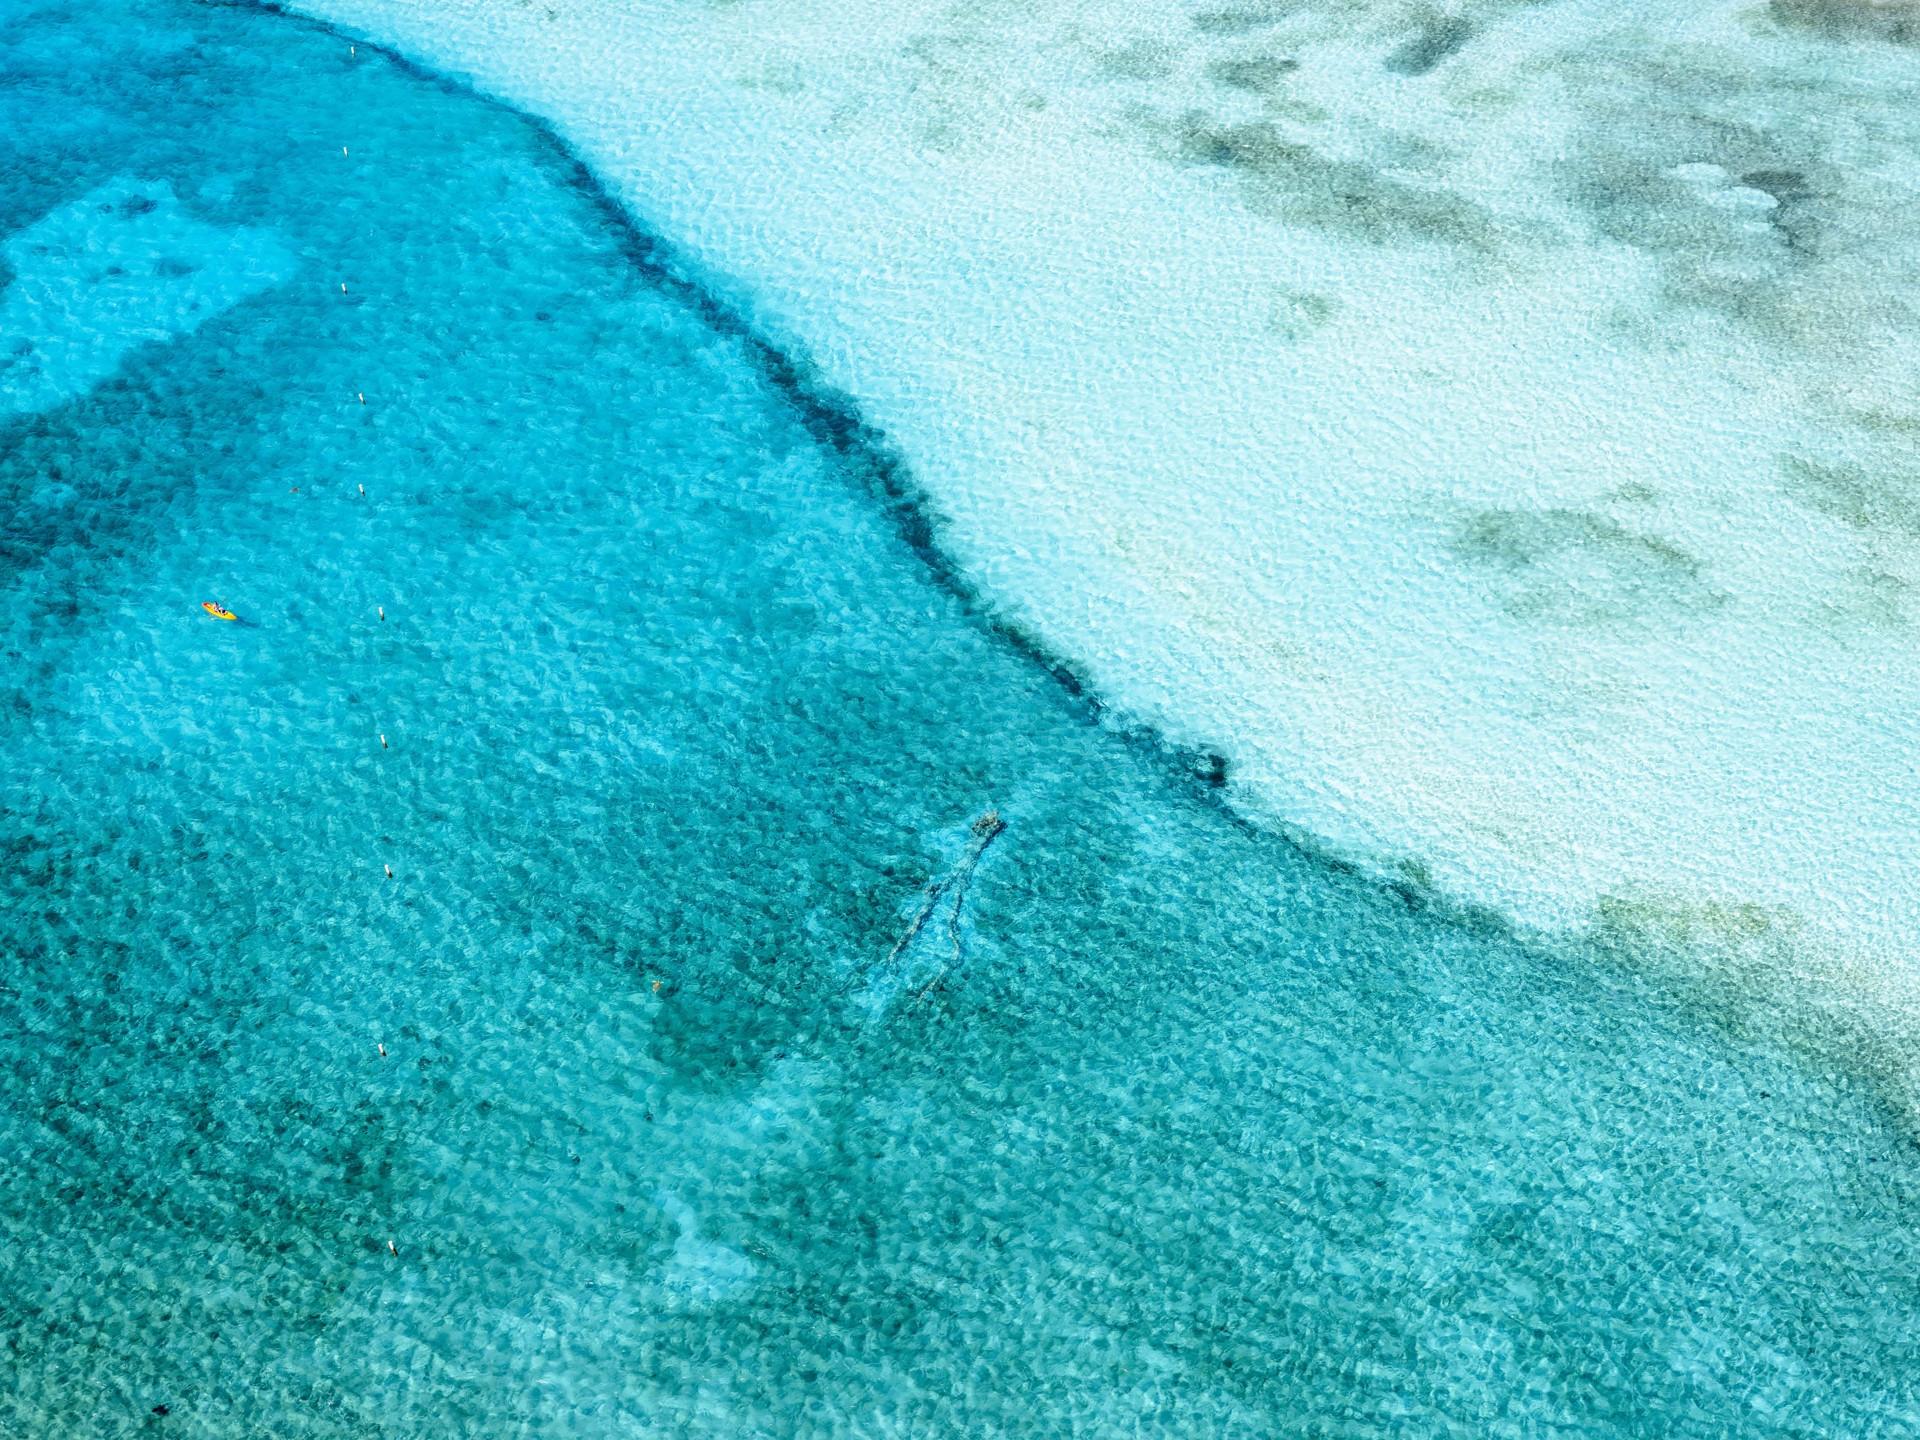 Sublime, Oil Nut Bay, British Virgin Islands by Dinesh Boaz